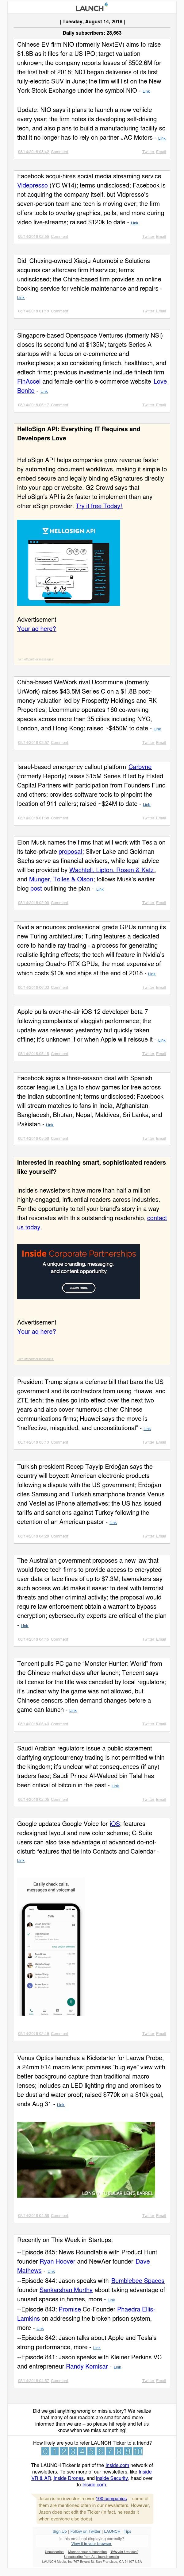 NIO files for $1.8B IPO, Facebook acqui-hires Vidpresso